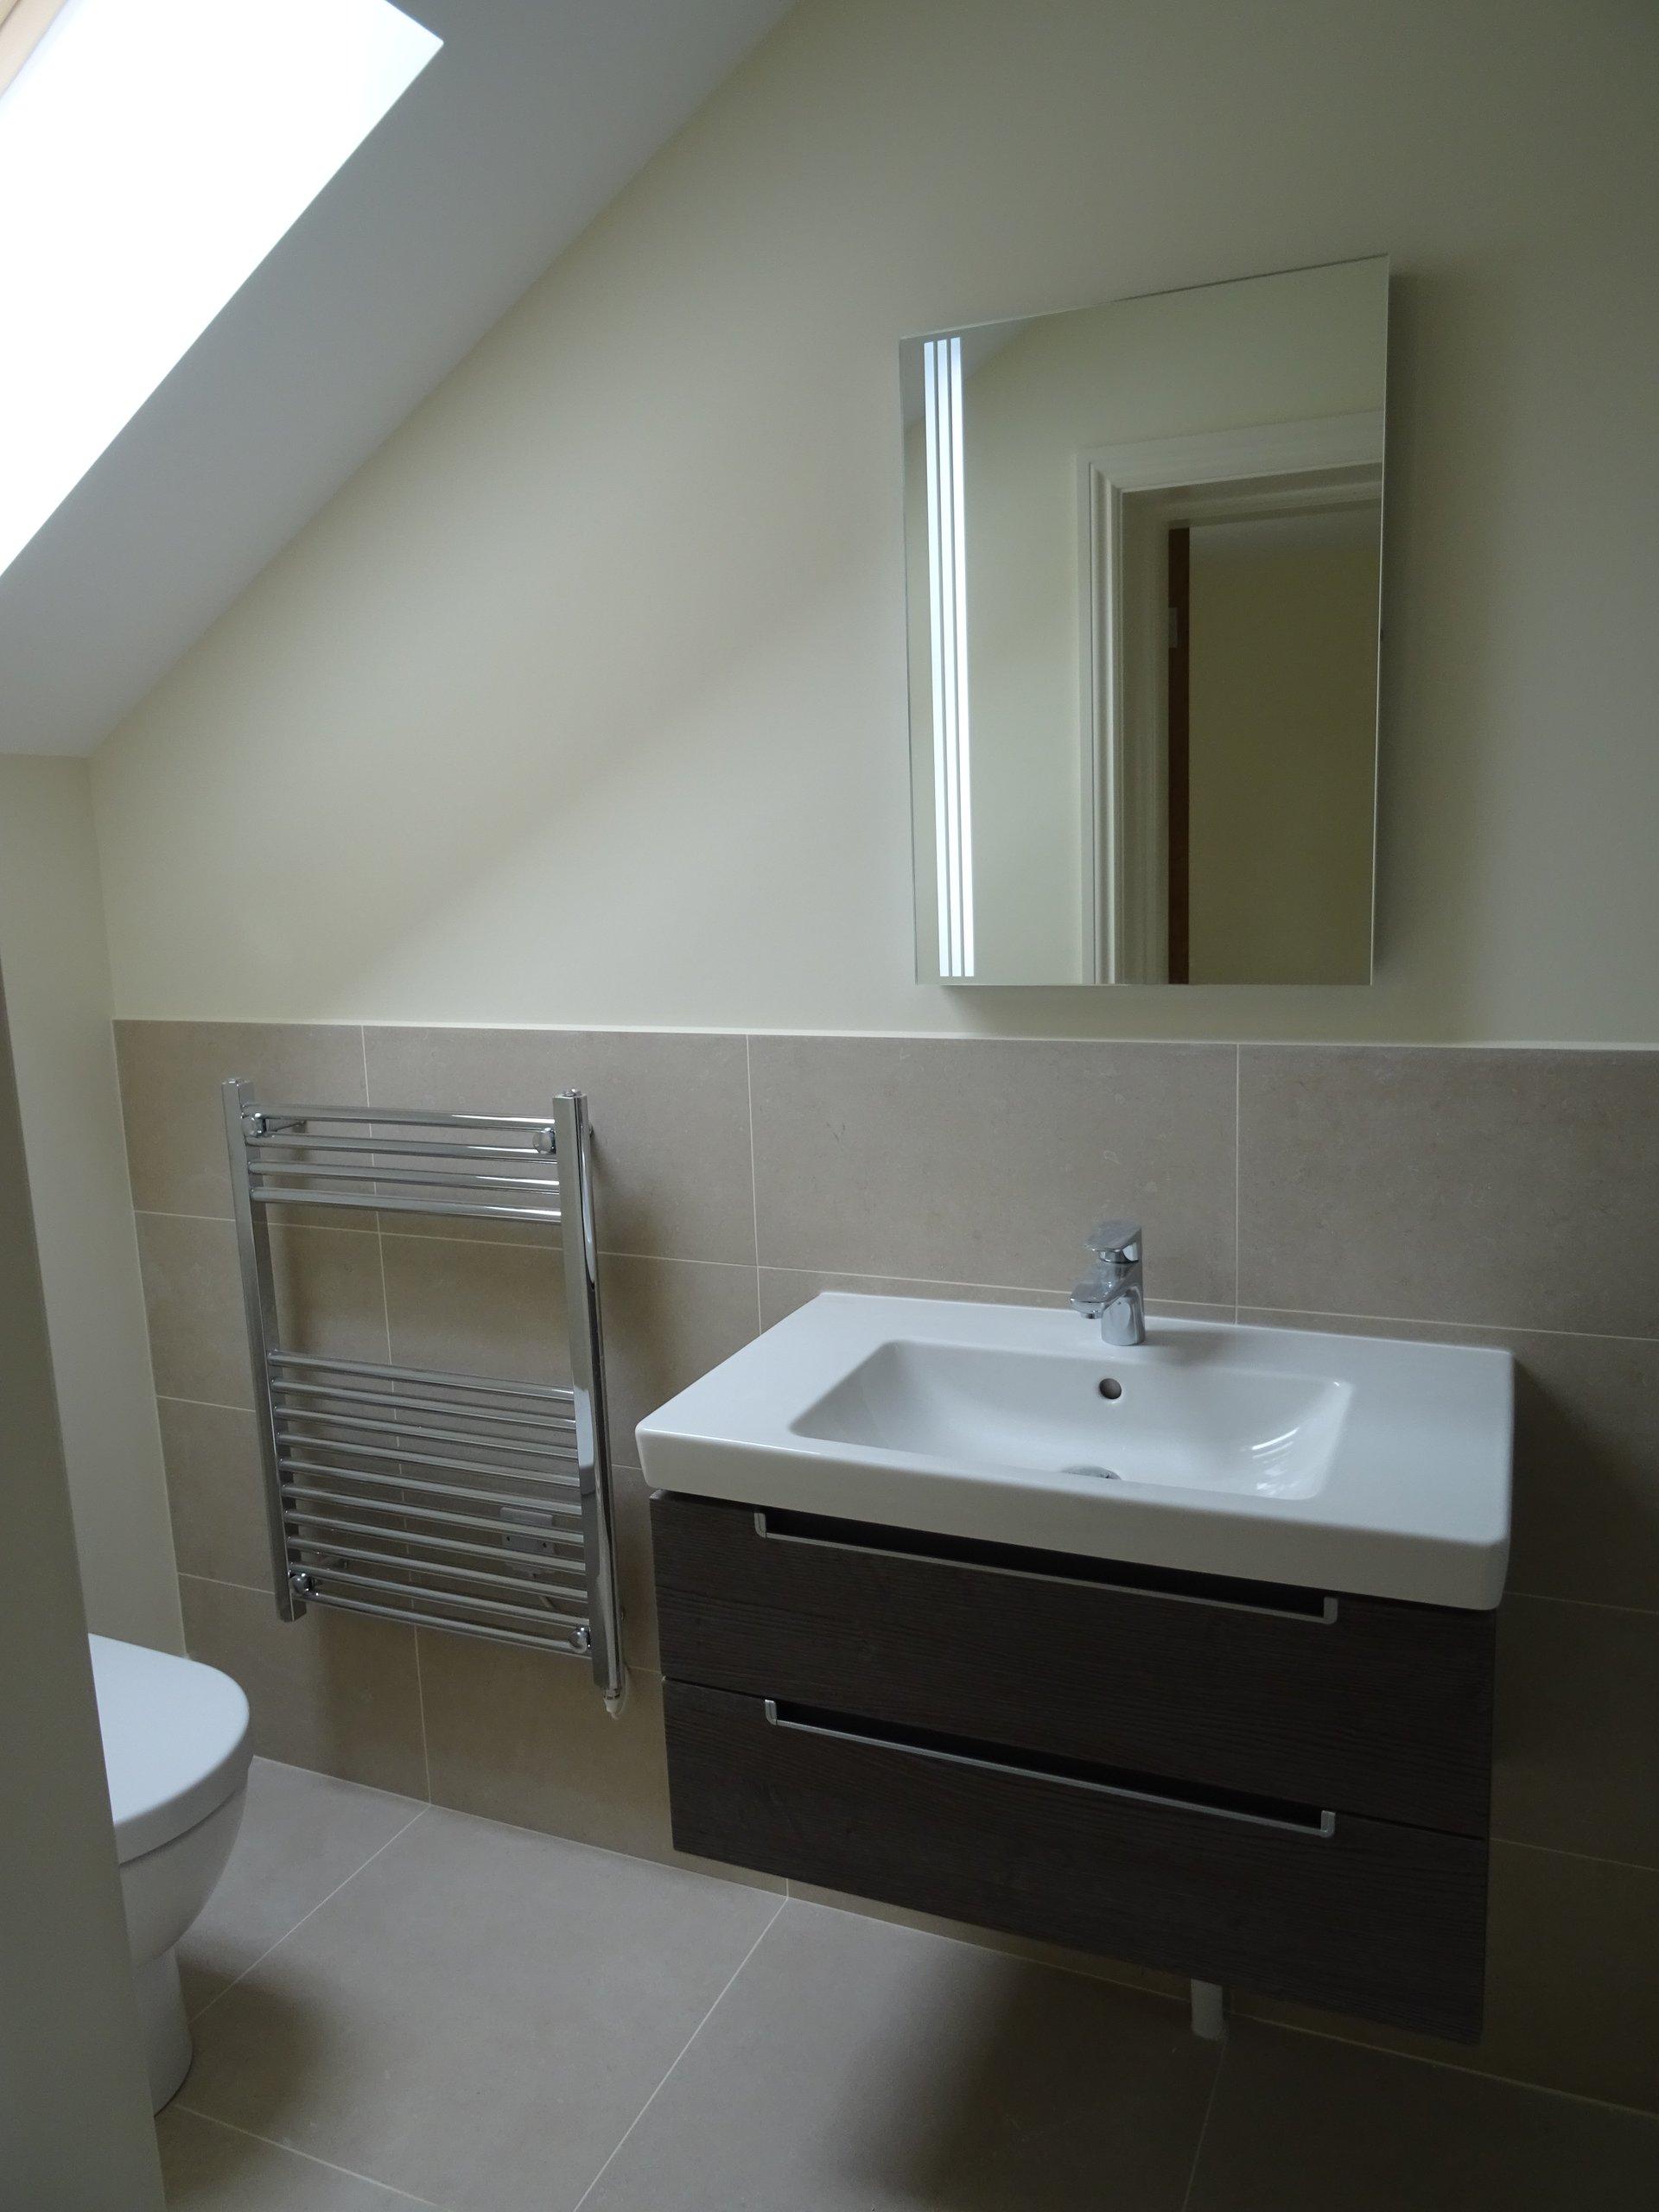 loft converted into a bathroom